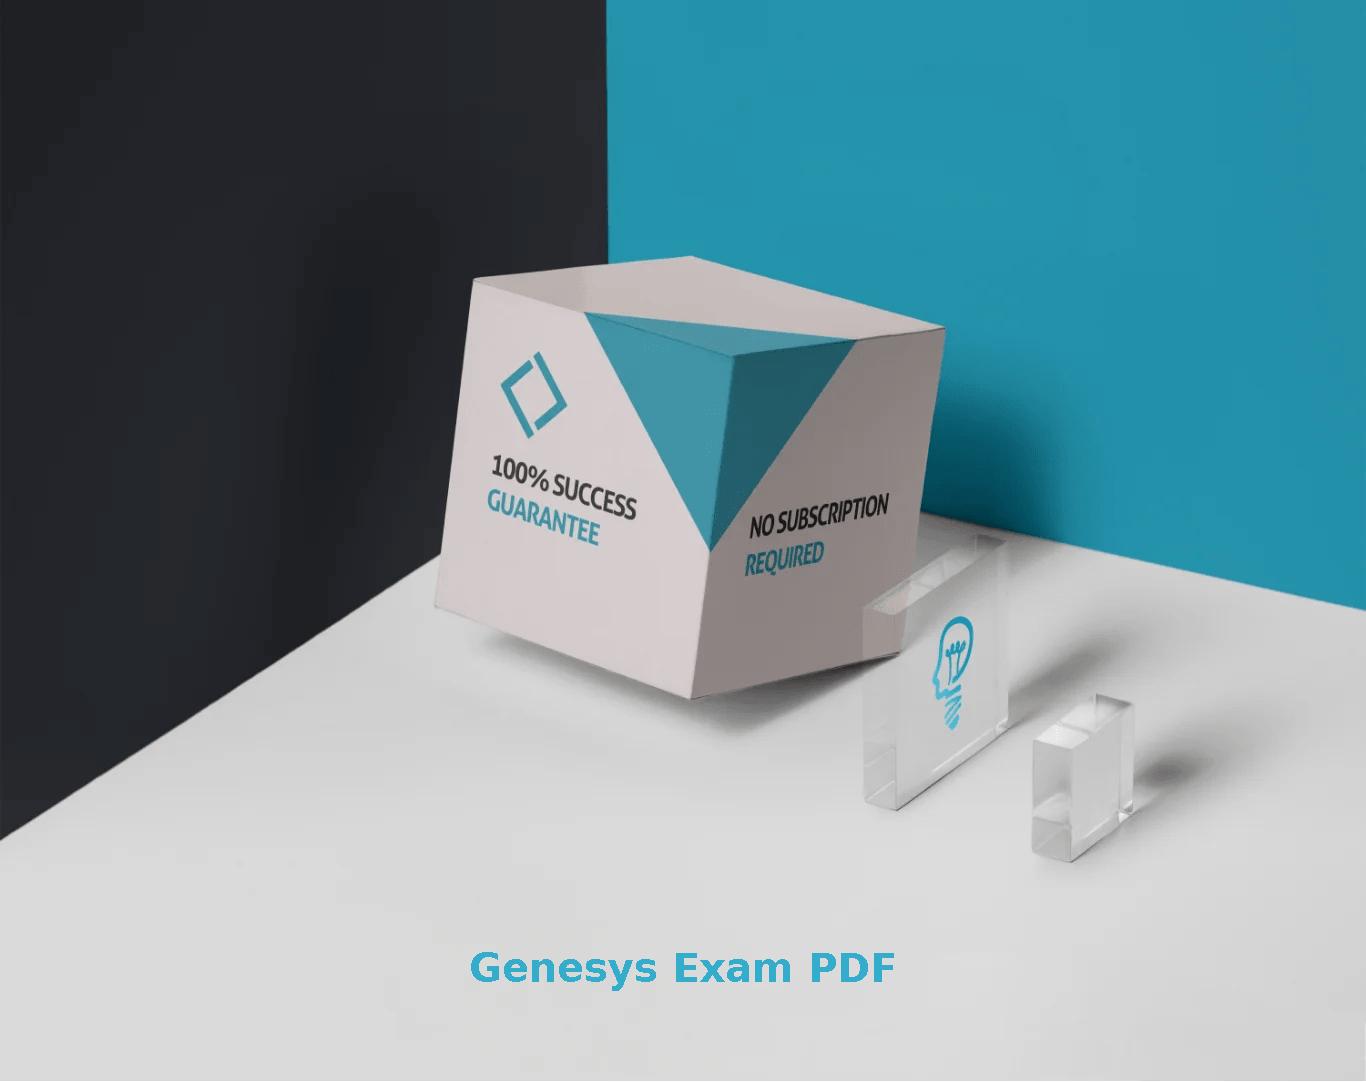 Genesys Exam PDF